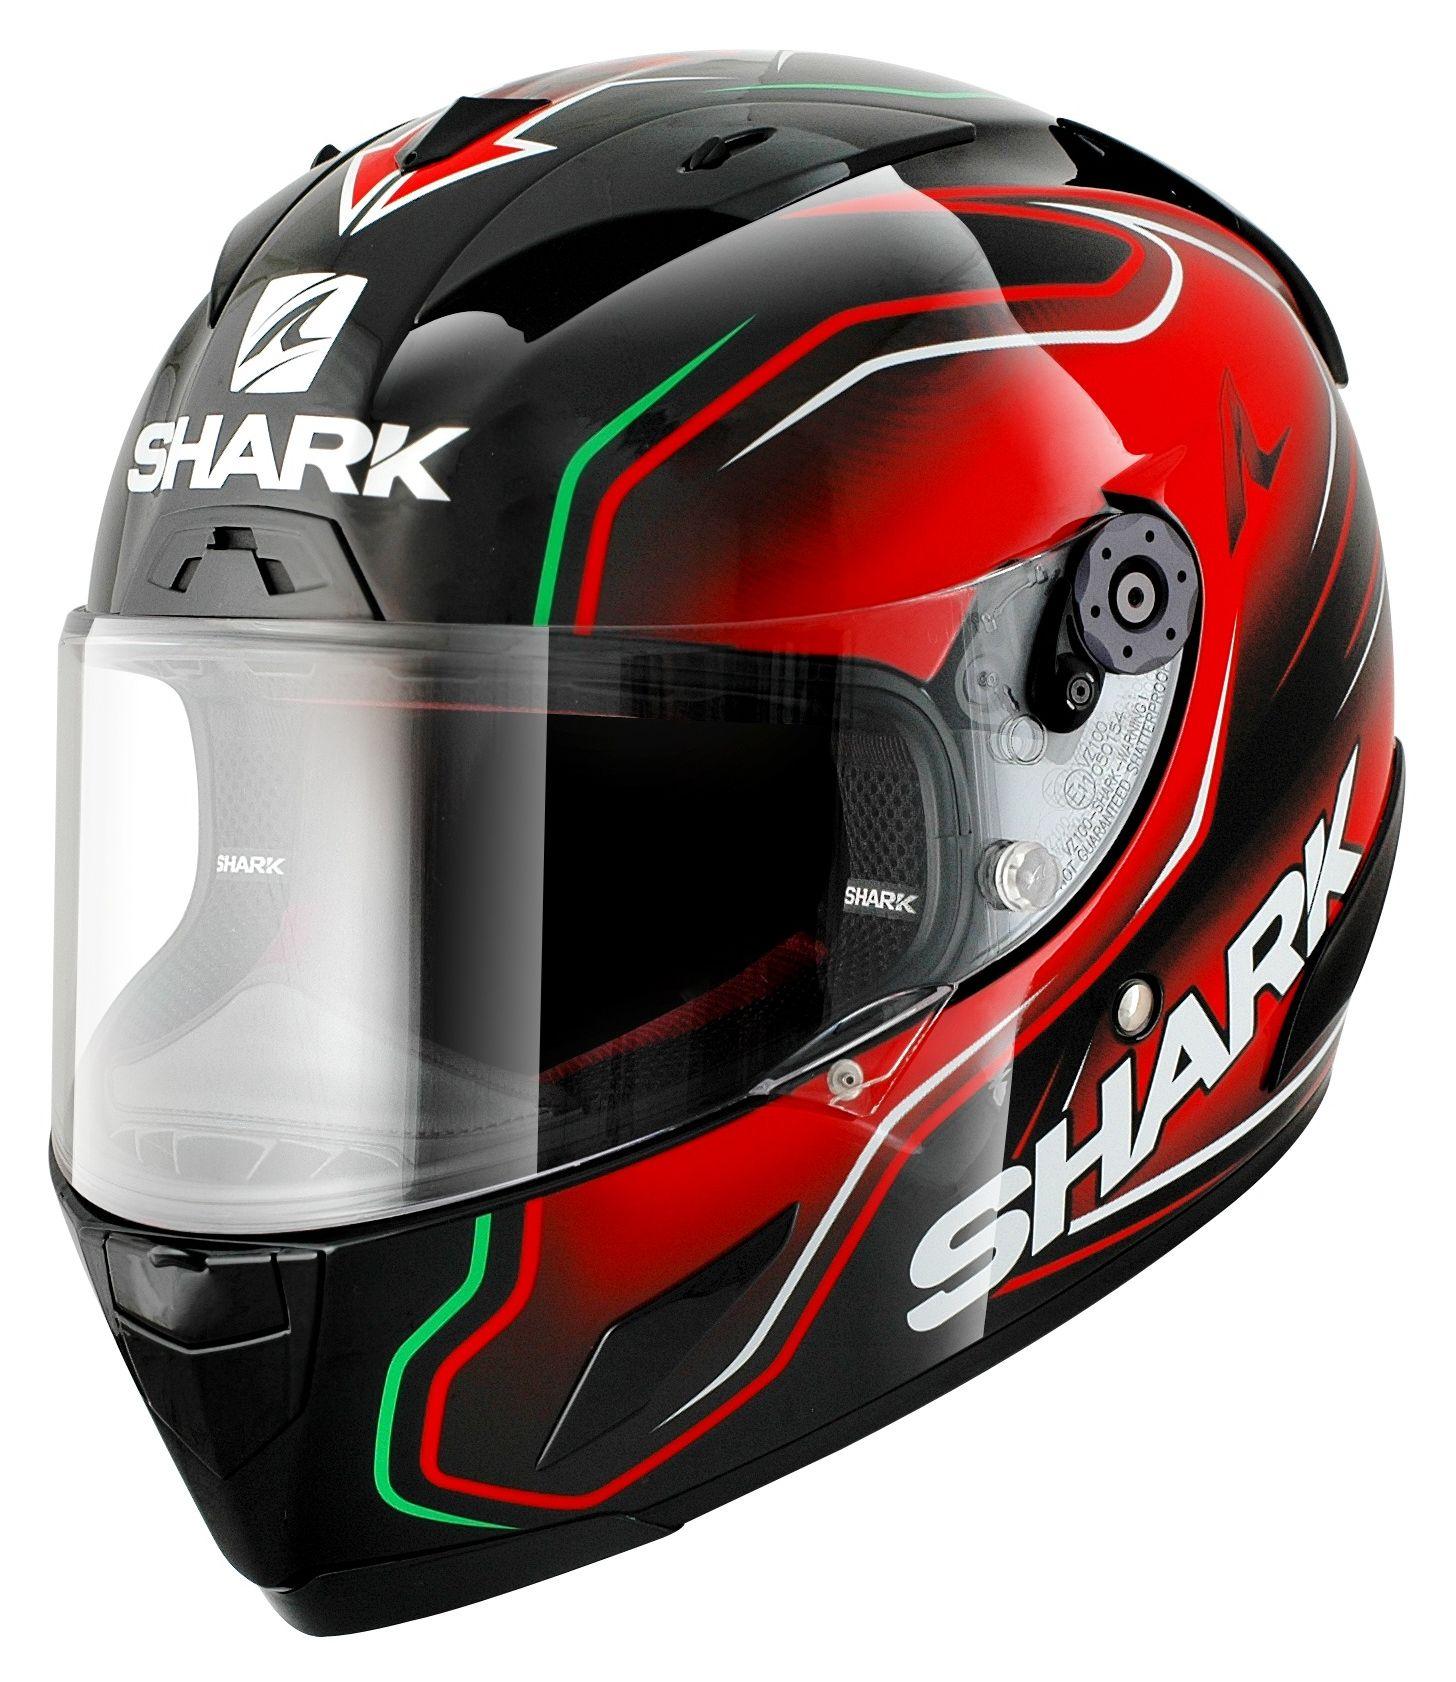 shark race r pro guintoli replica helmet size xs only revzilla. Black Bedroom Furniture Sets. Home Design Ideas